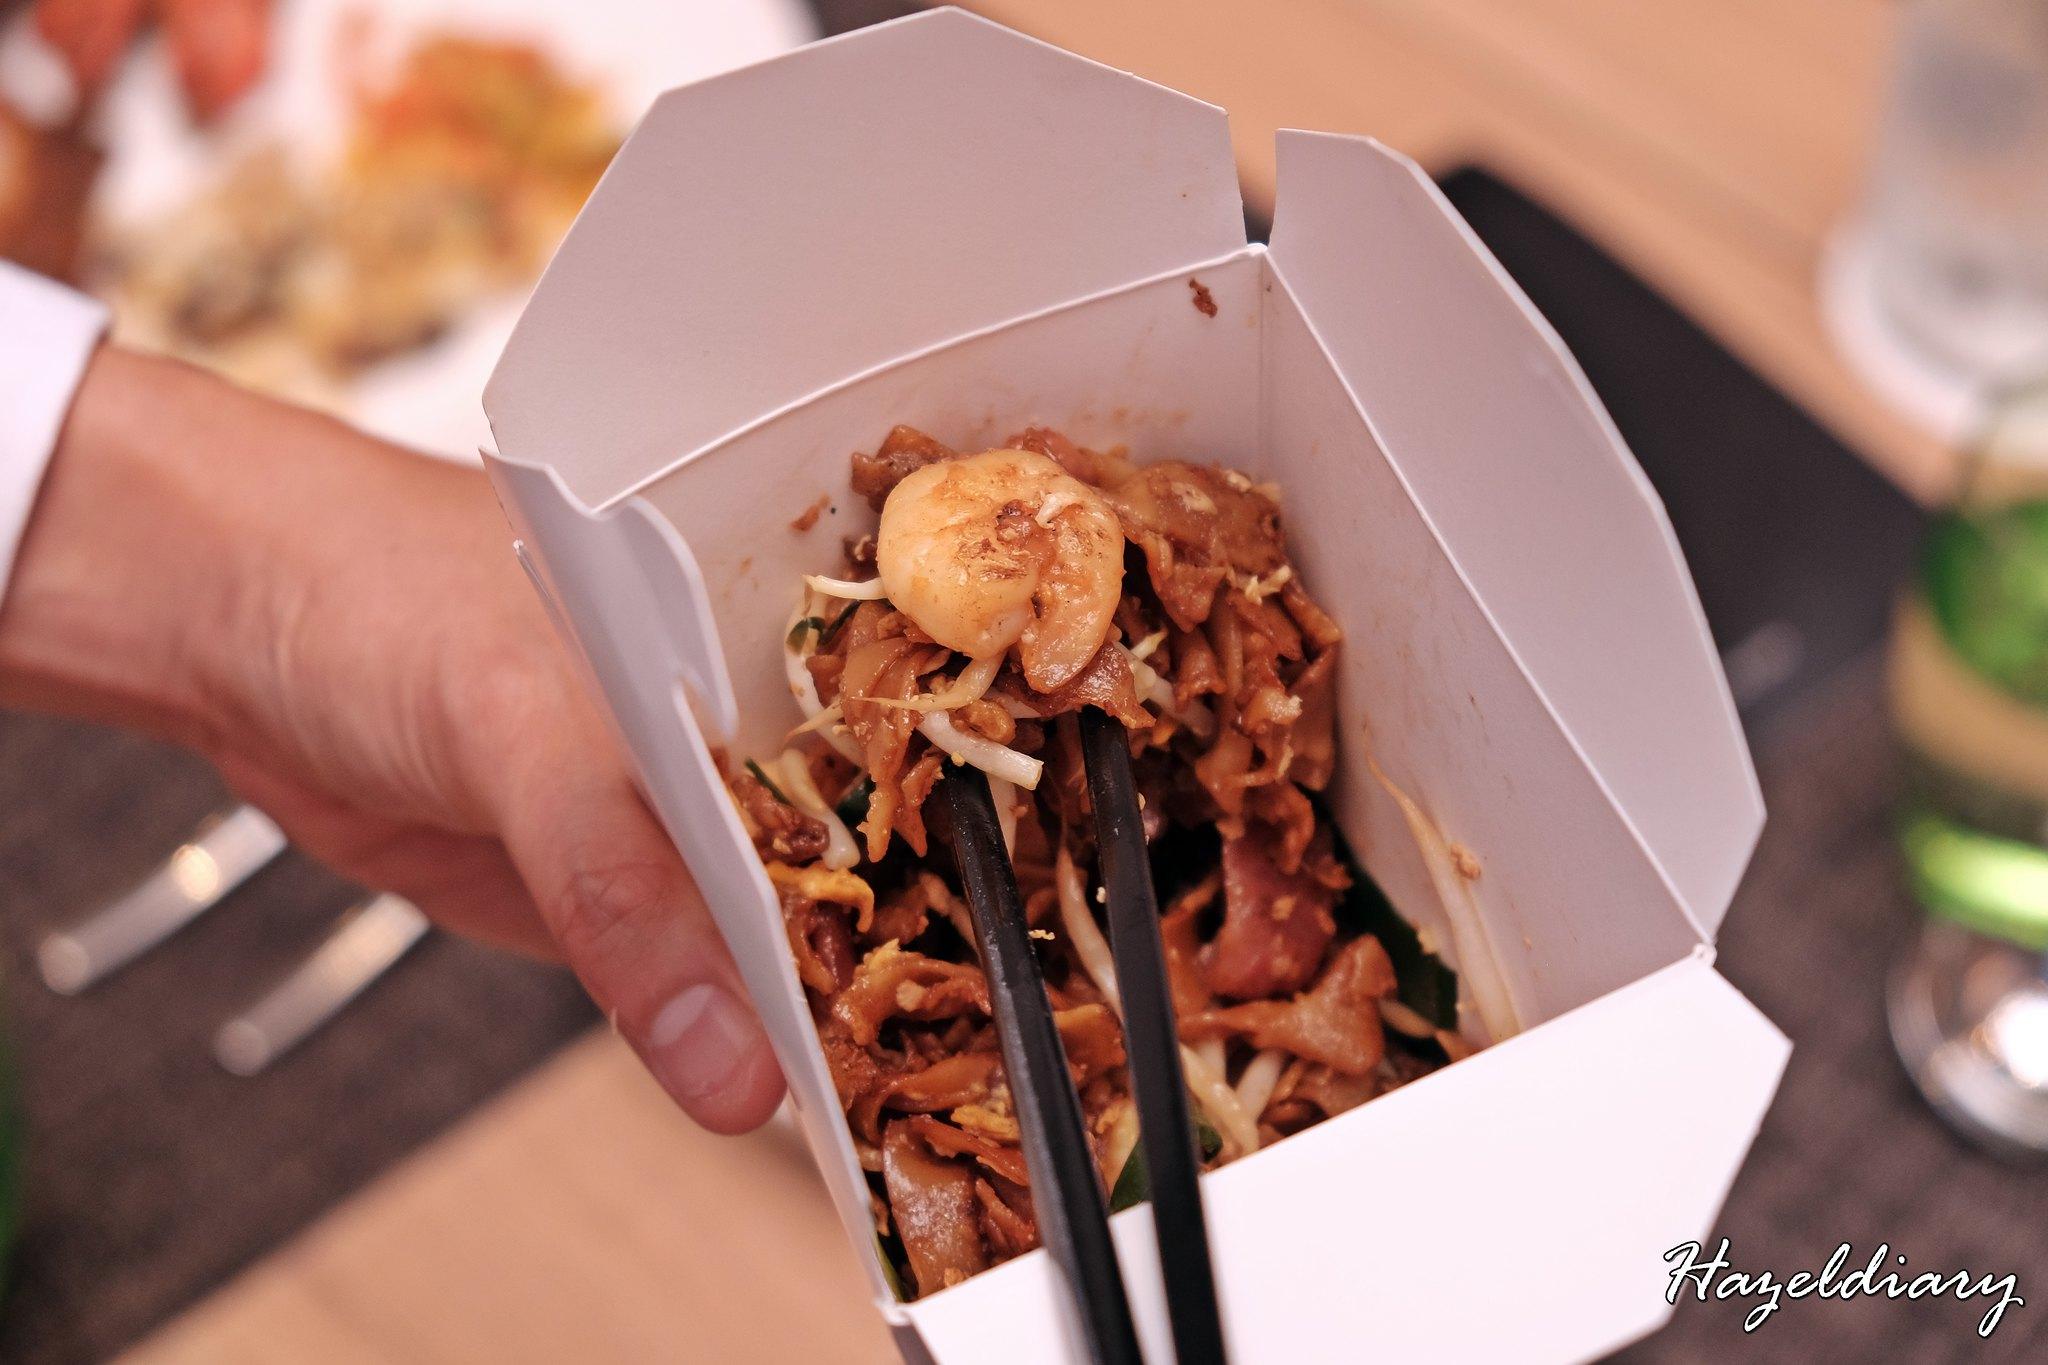 Penang Food Fare Buffet-Sky22 Courtyard Marriott-Penang Char Kuey Teow